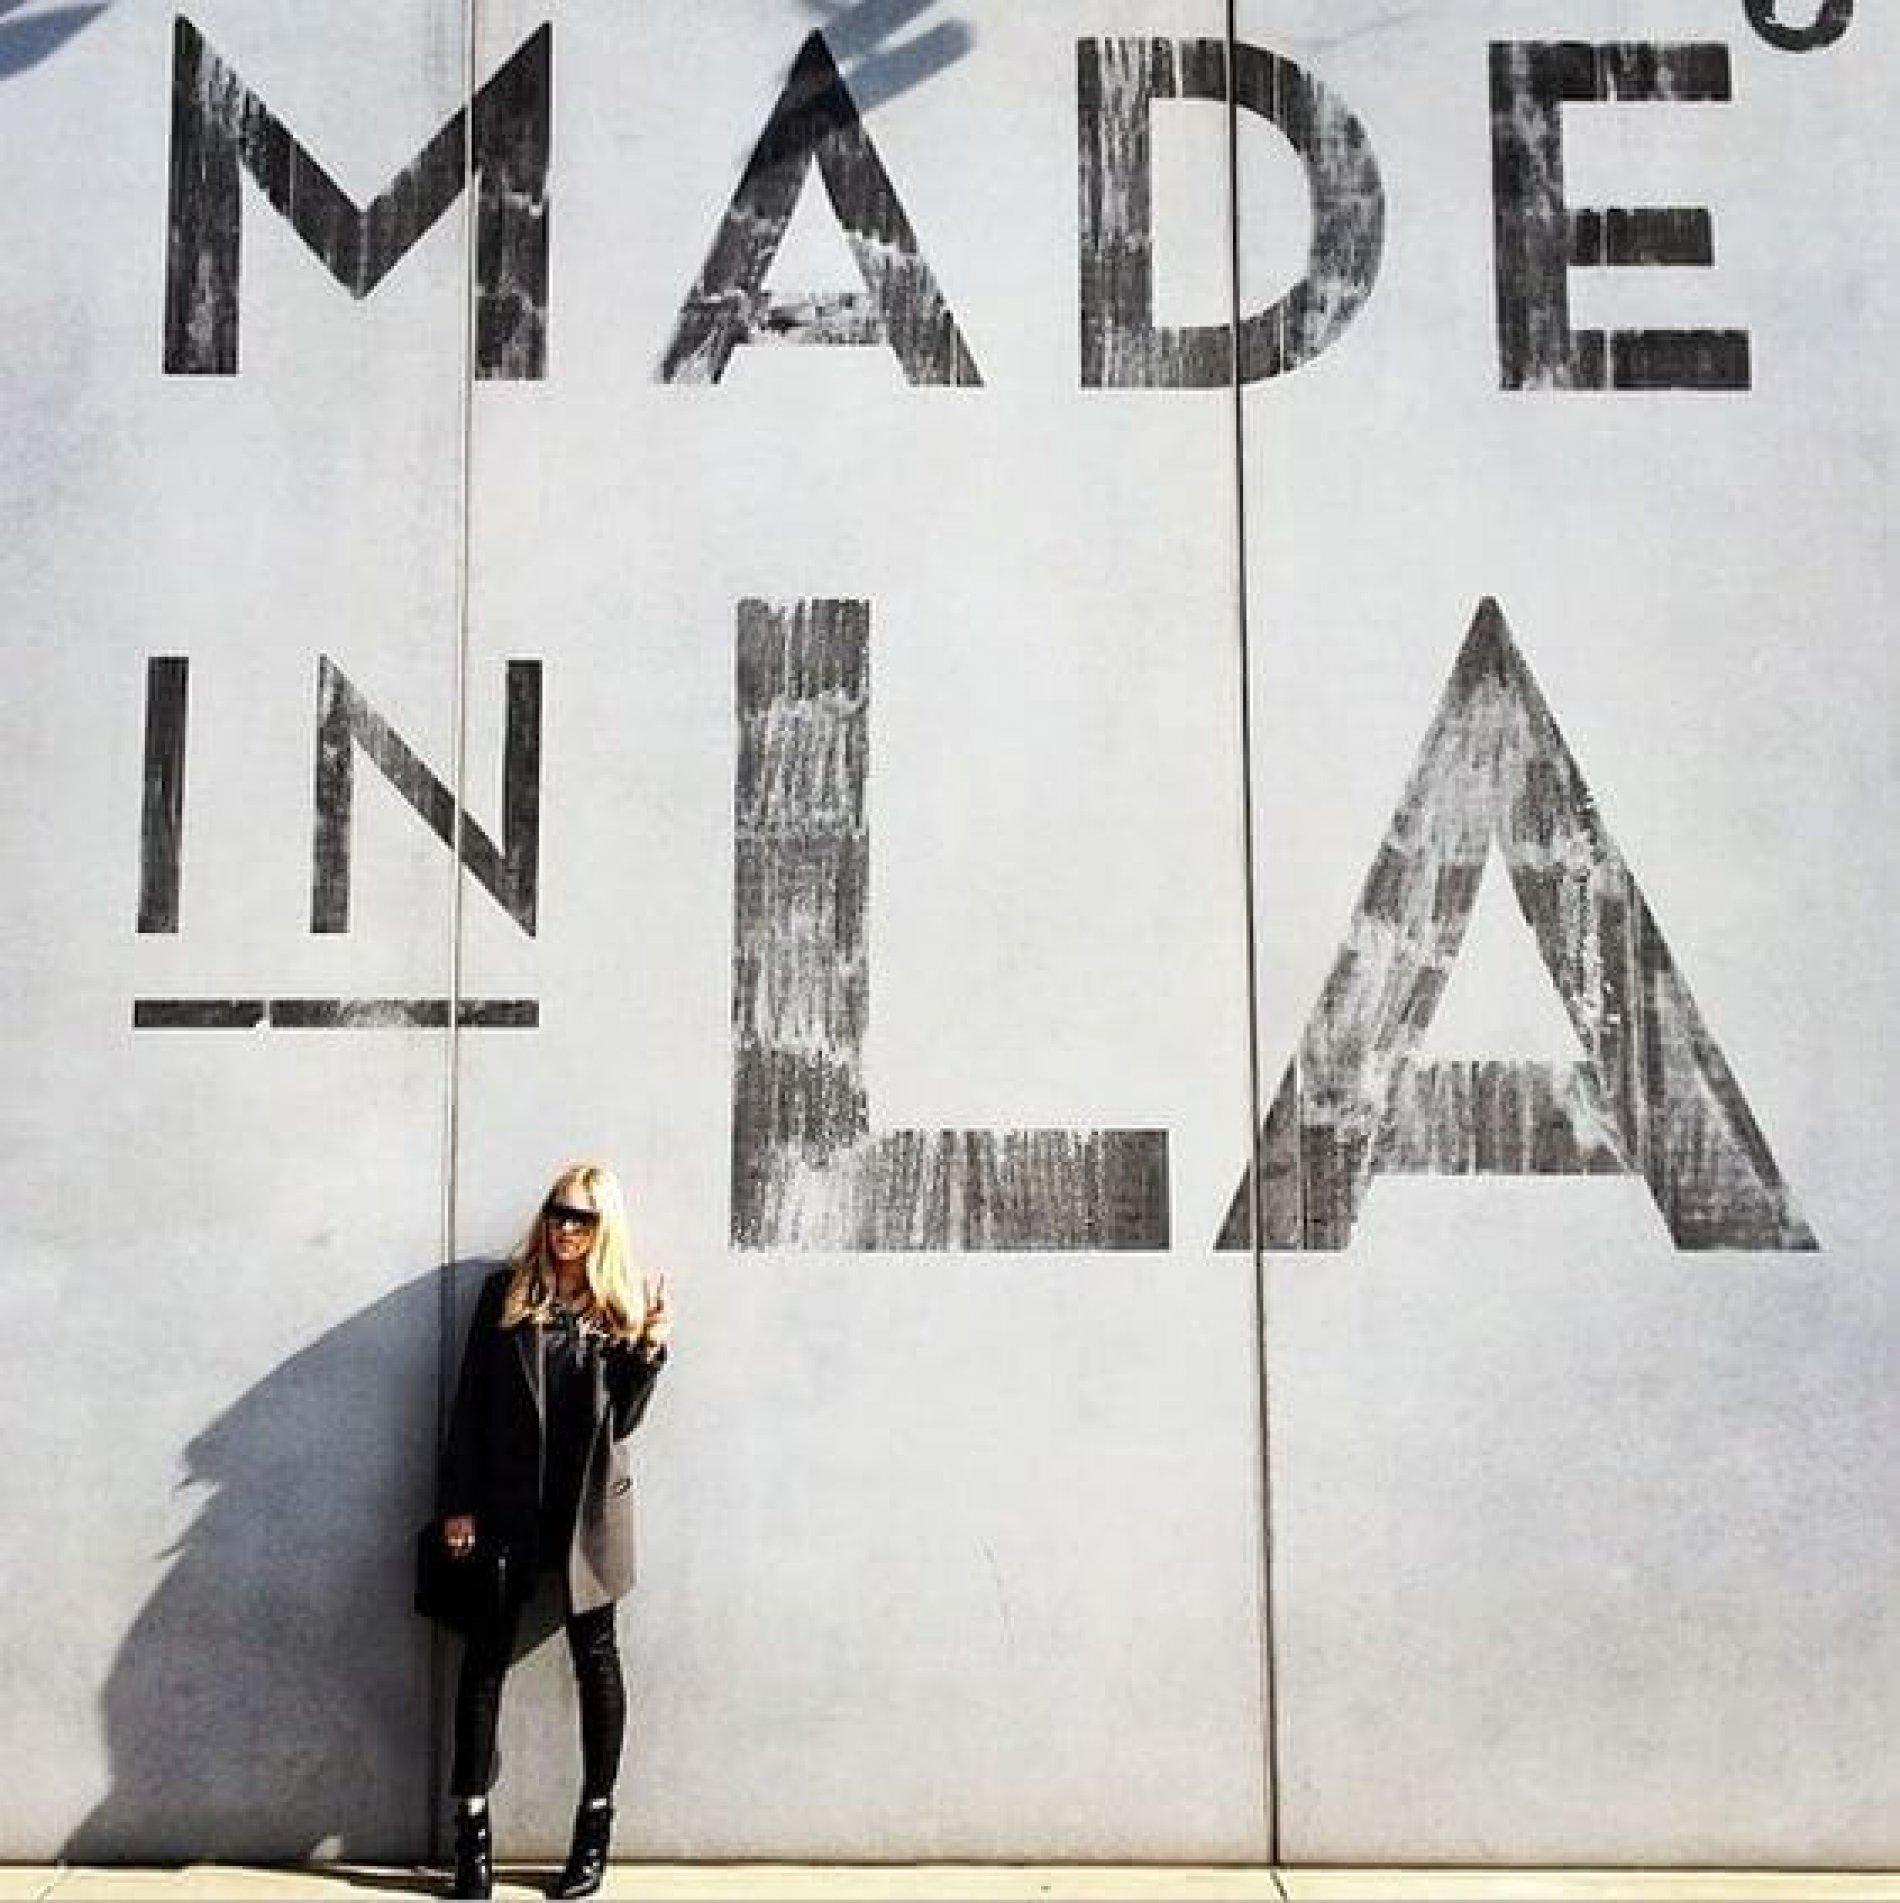 NAUGHTY GIRL IN LOS ANGELES ・゚✧ | ADINA RIVERS